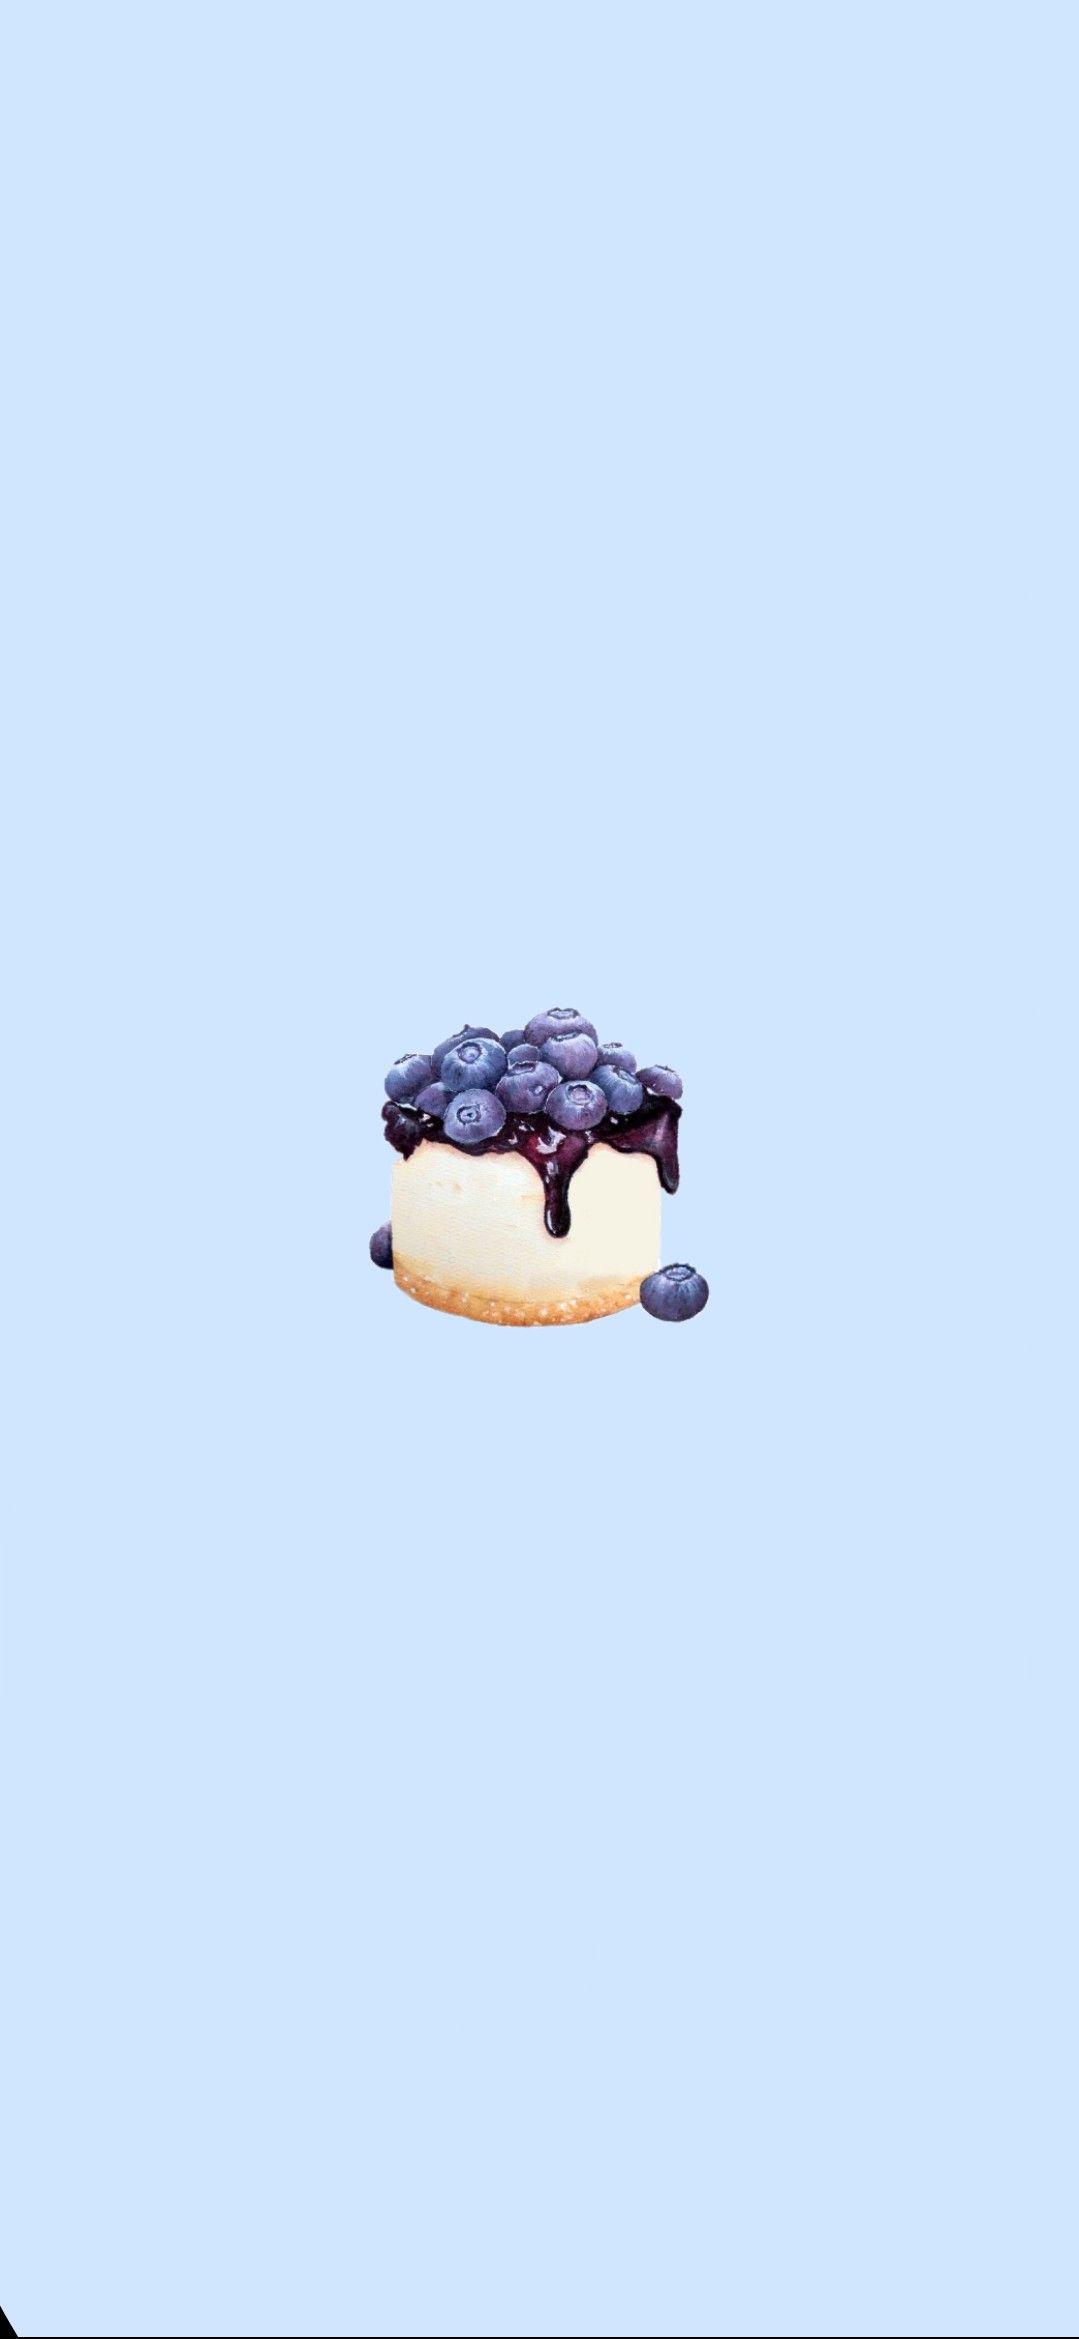 Cute Blue Blueberry Cake Iphone Wallpaper Cake Wallpaper Cute Wallpapers Kawaii Wallpaper